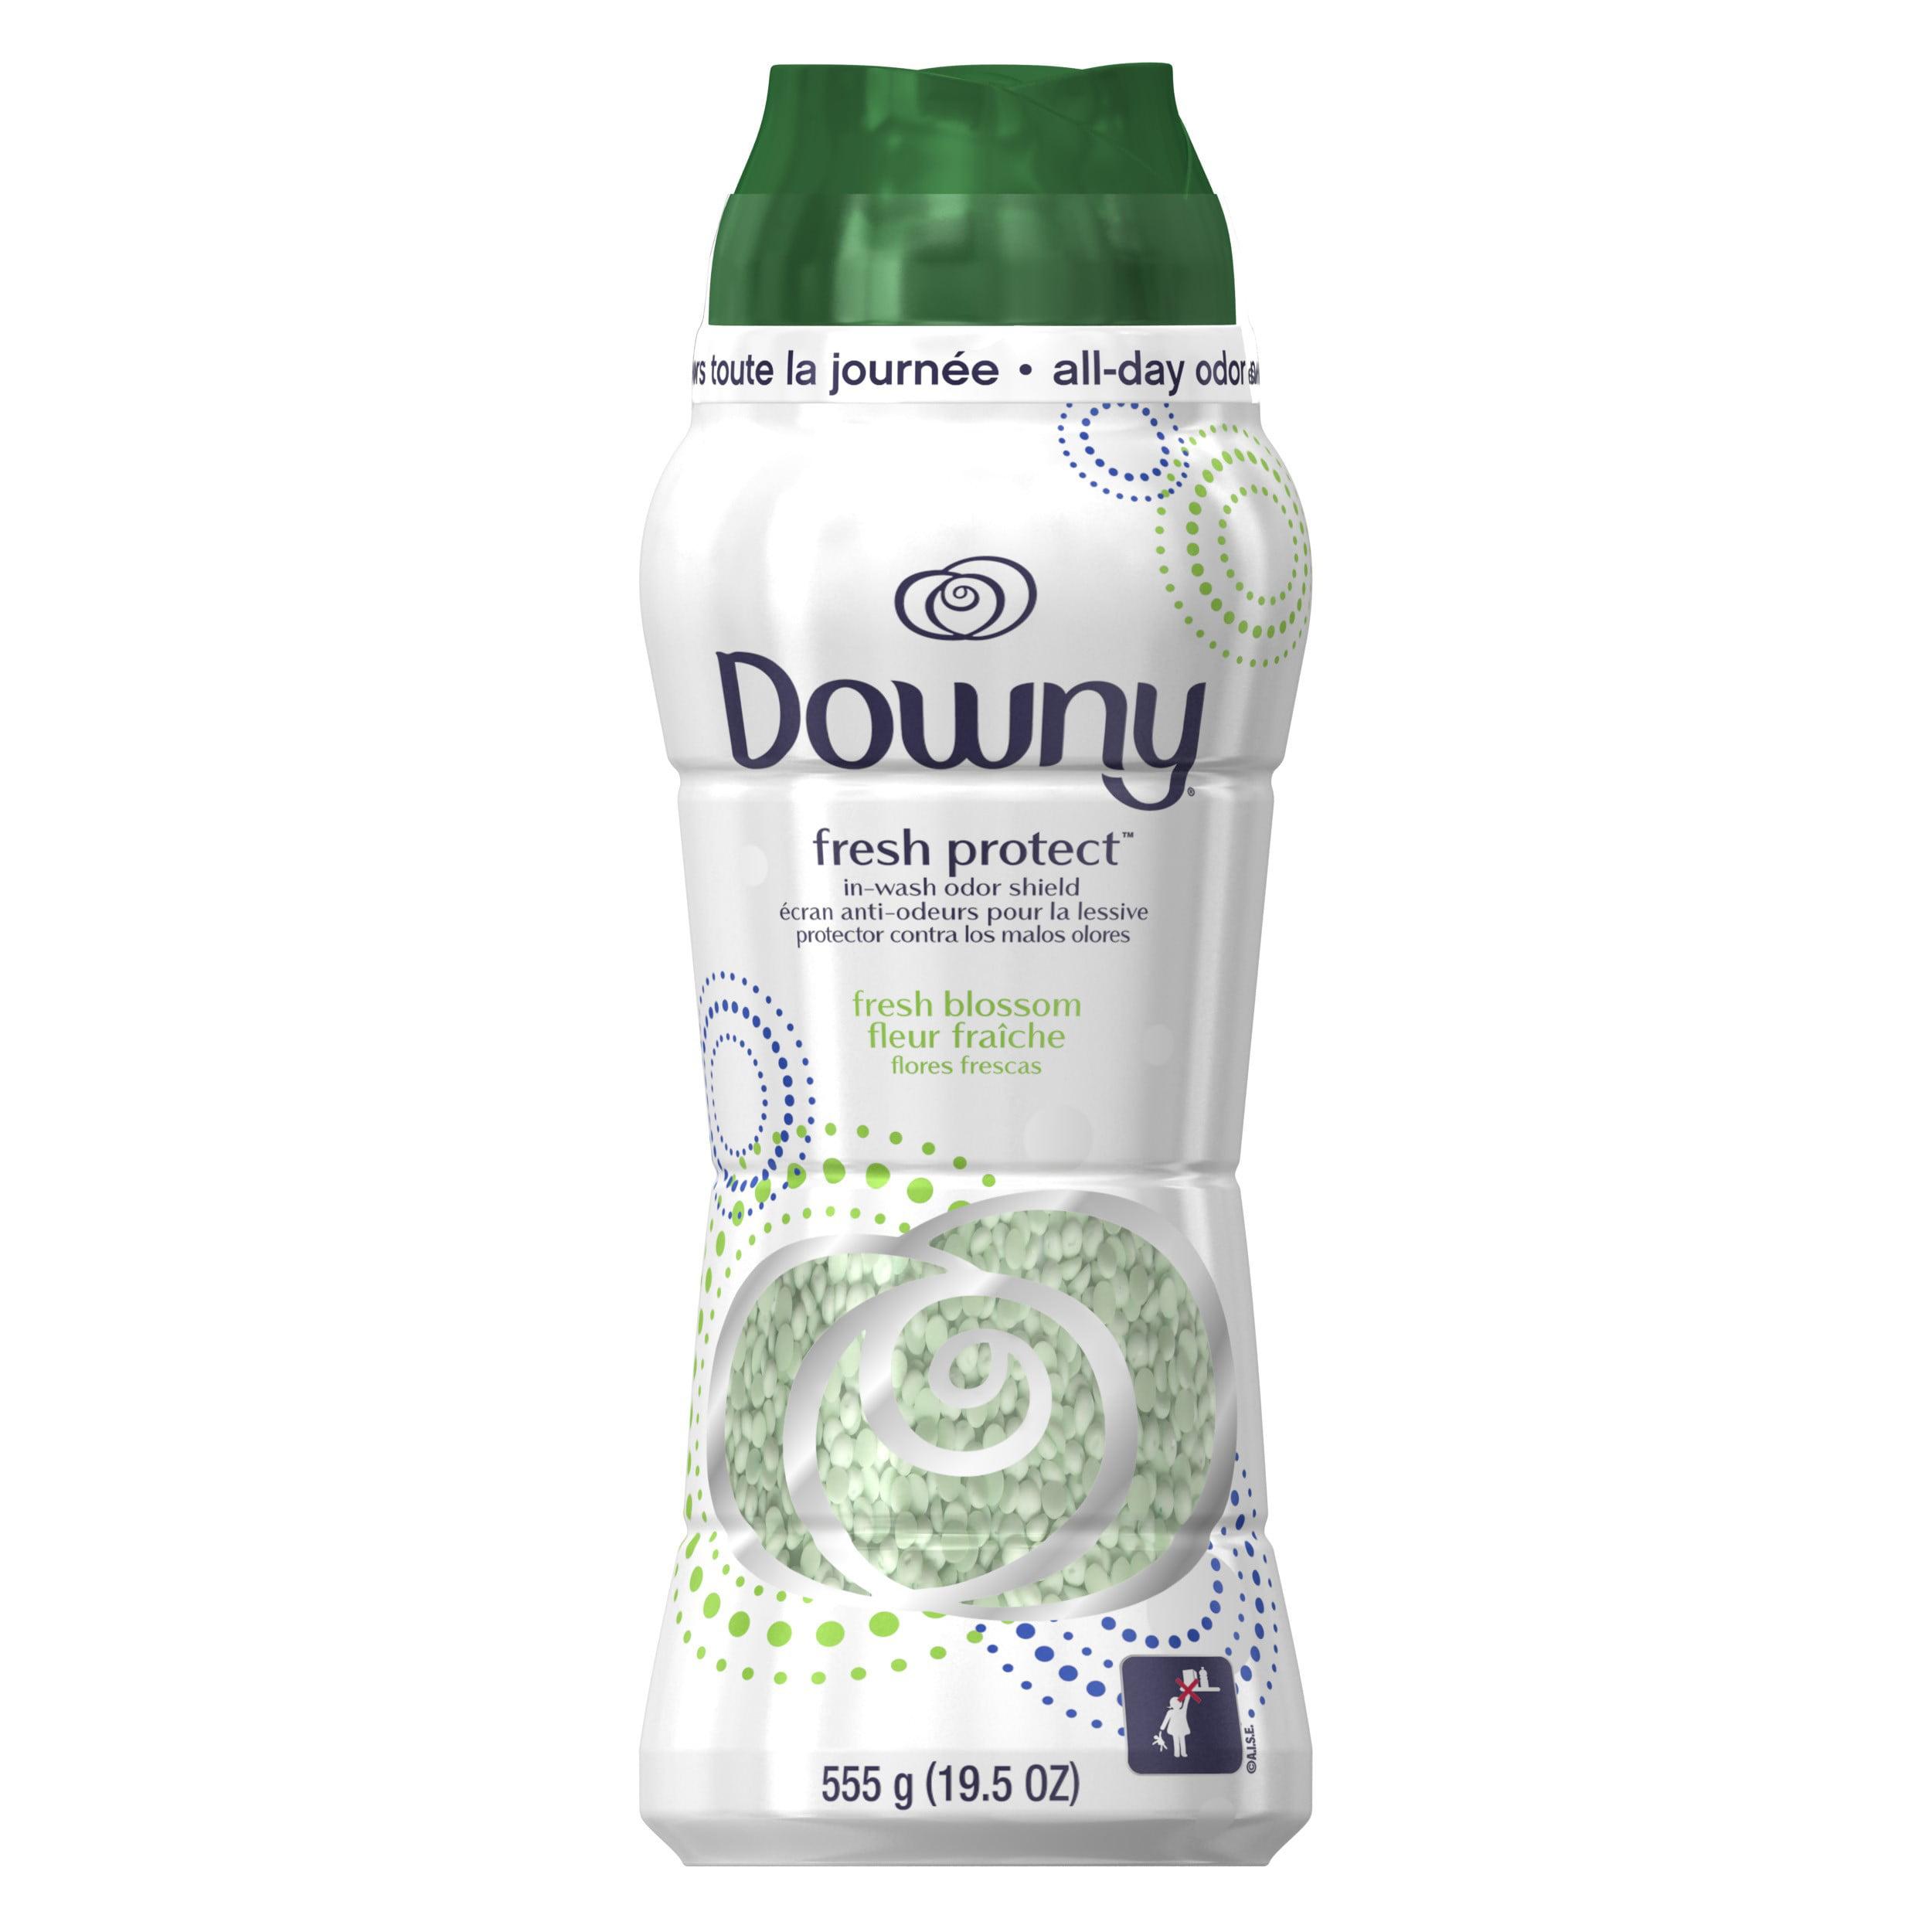 Downy Sport Odor Defense In-Wash Scent Beads, Fresh Blossom, 19.5 oz